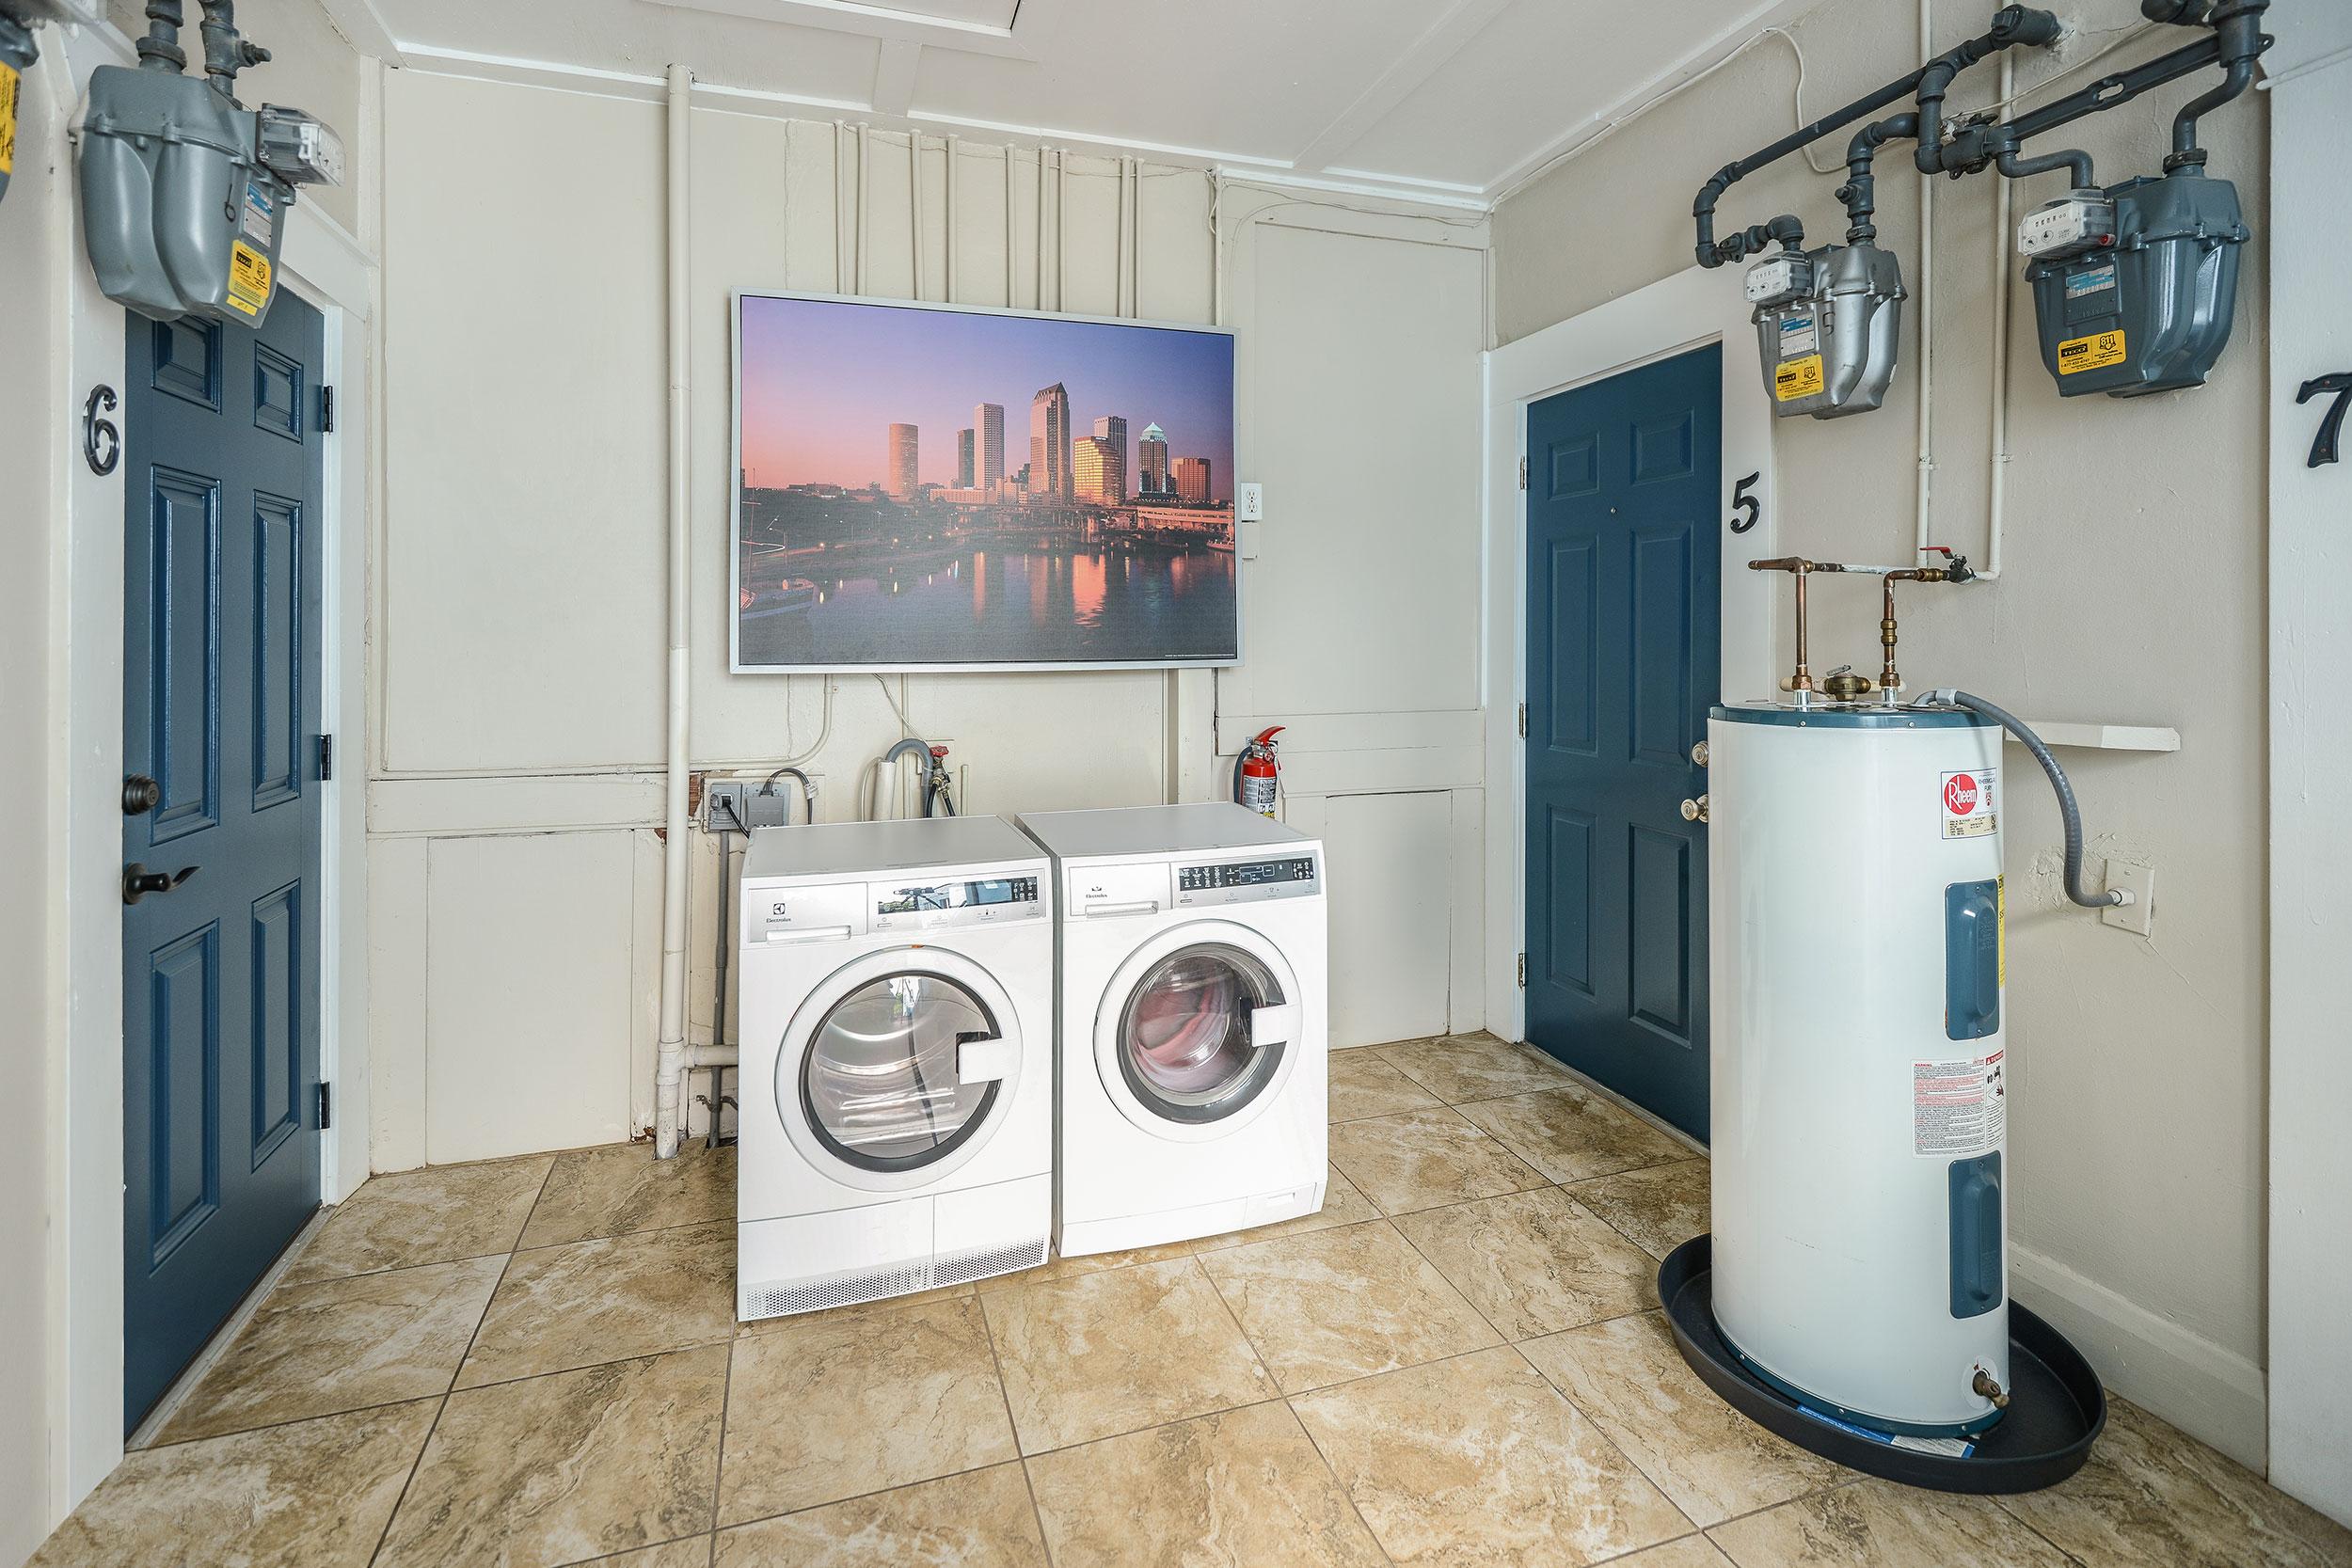 Plf-laundry-center